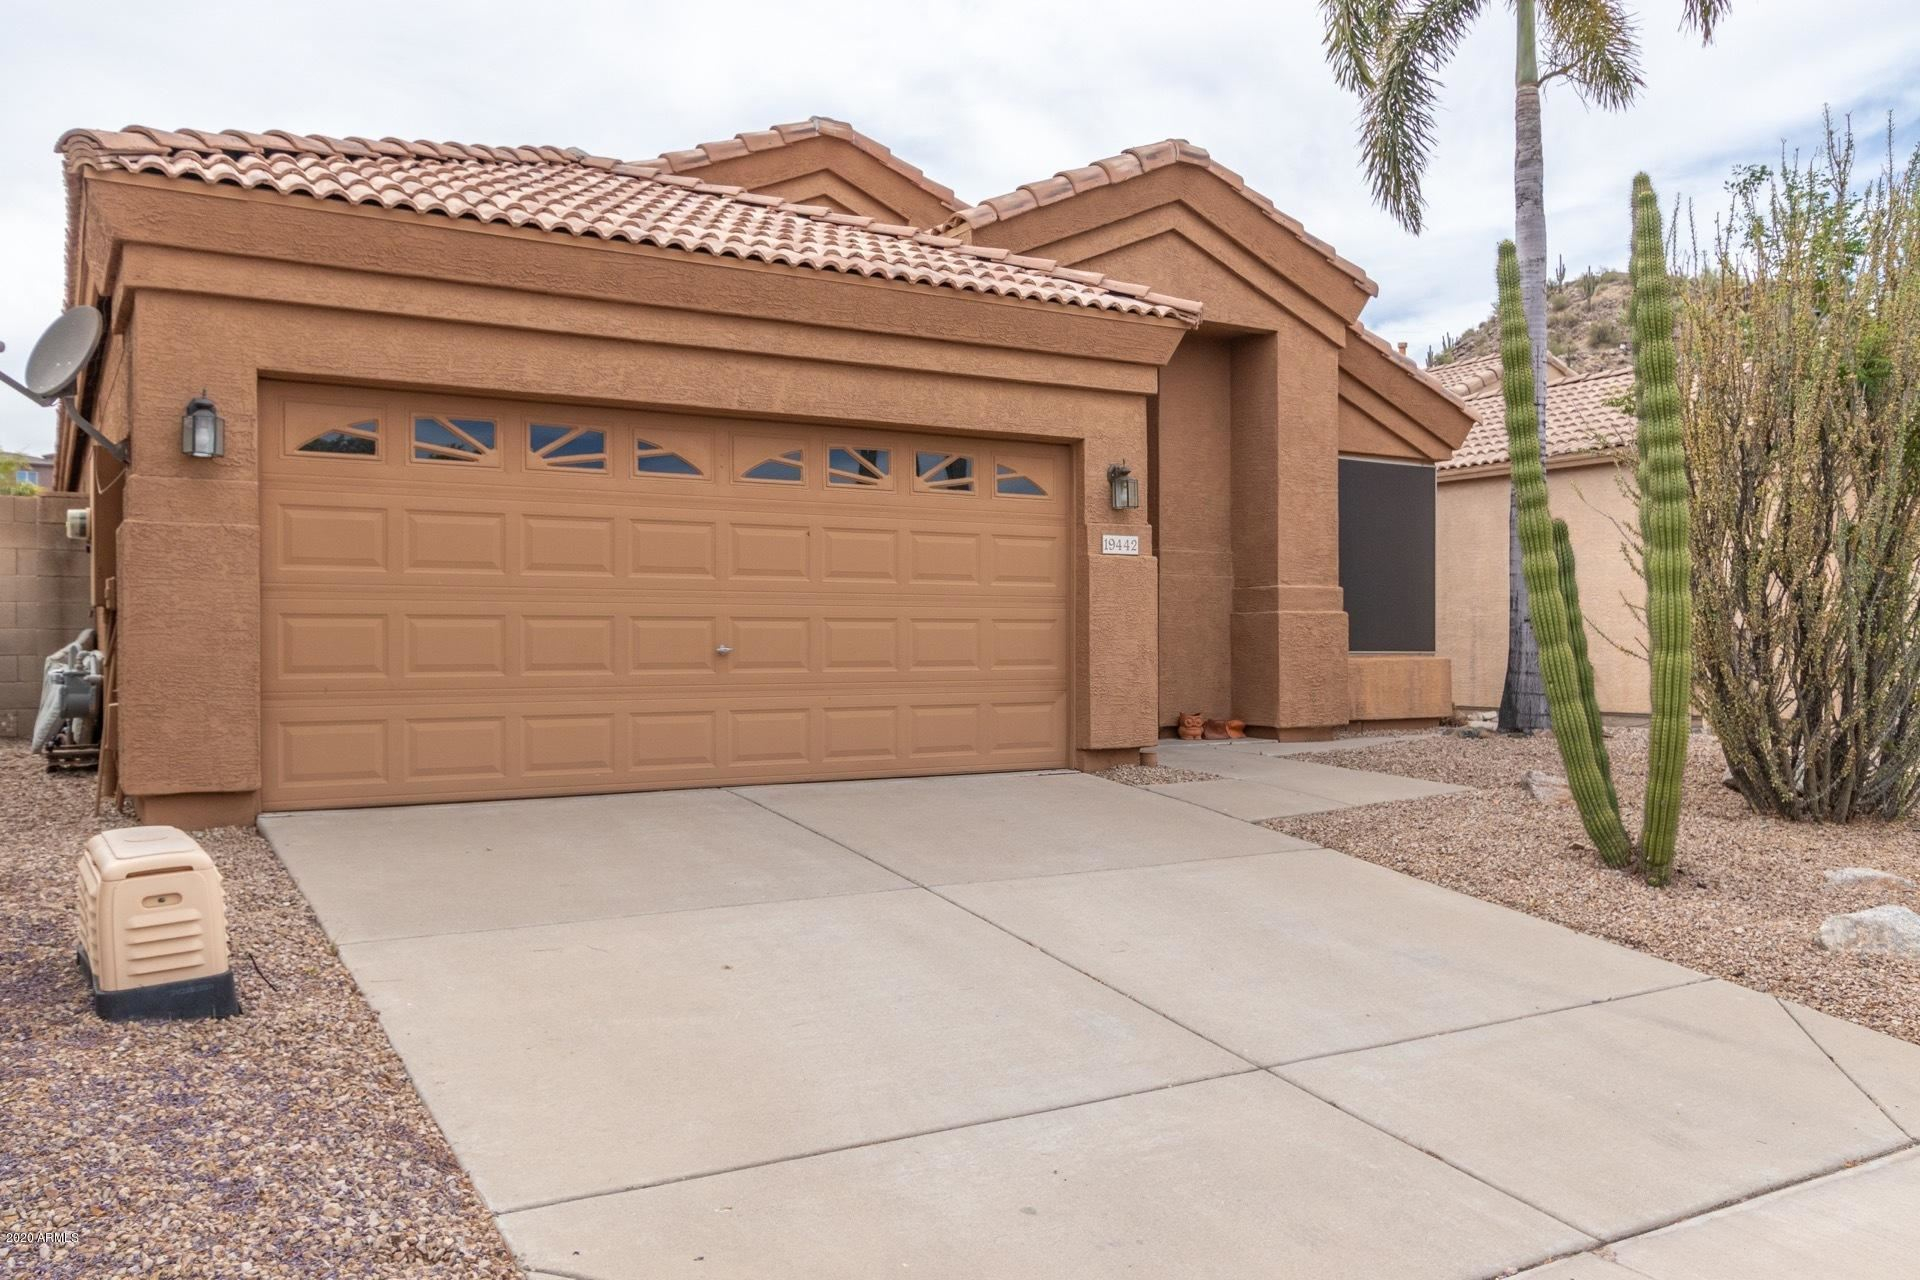 19442 N 23RD Way, Phoenix, AZ 85024 - MLS#: 6091156